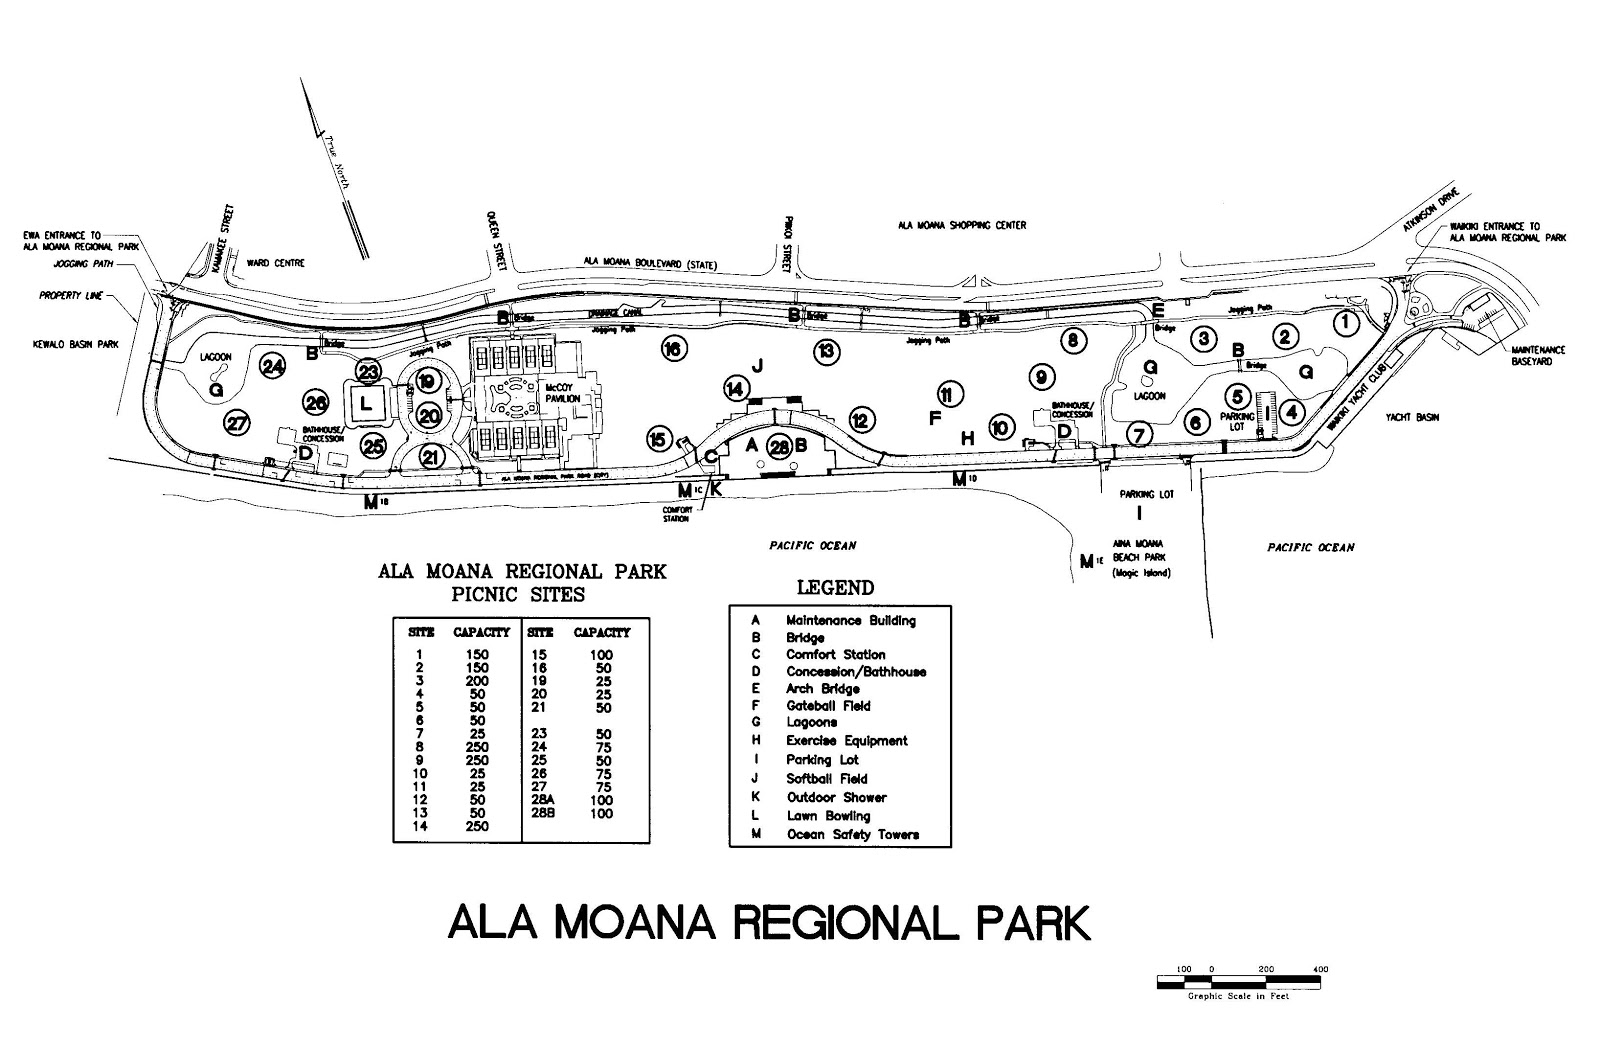 Ala Moana Beach Park Magic Island Picnic Sites Map